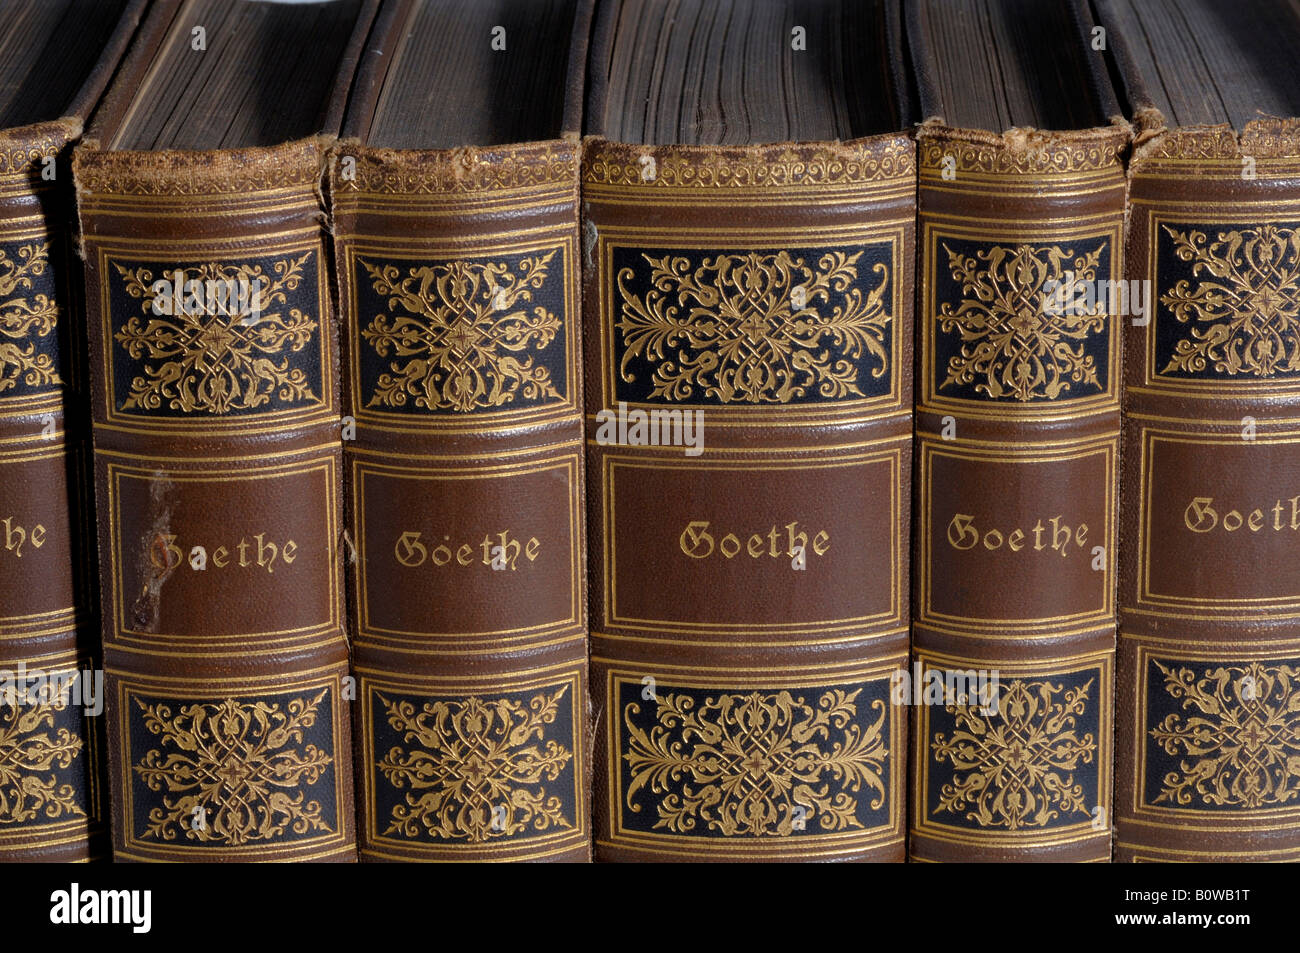 Old classics edition books, Goethe - Stock Image